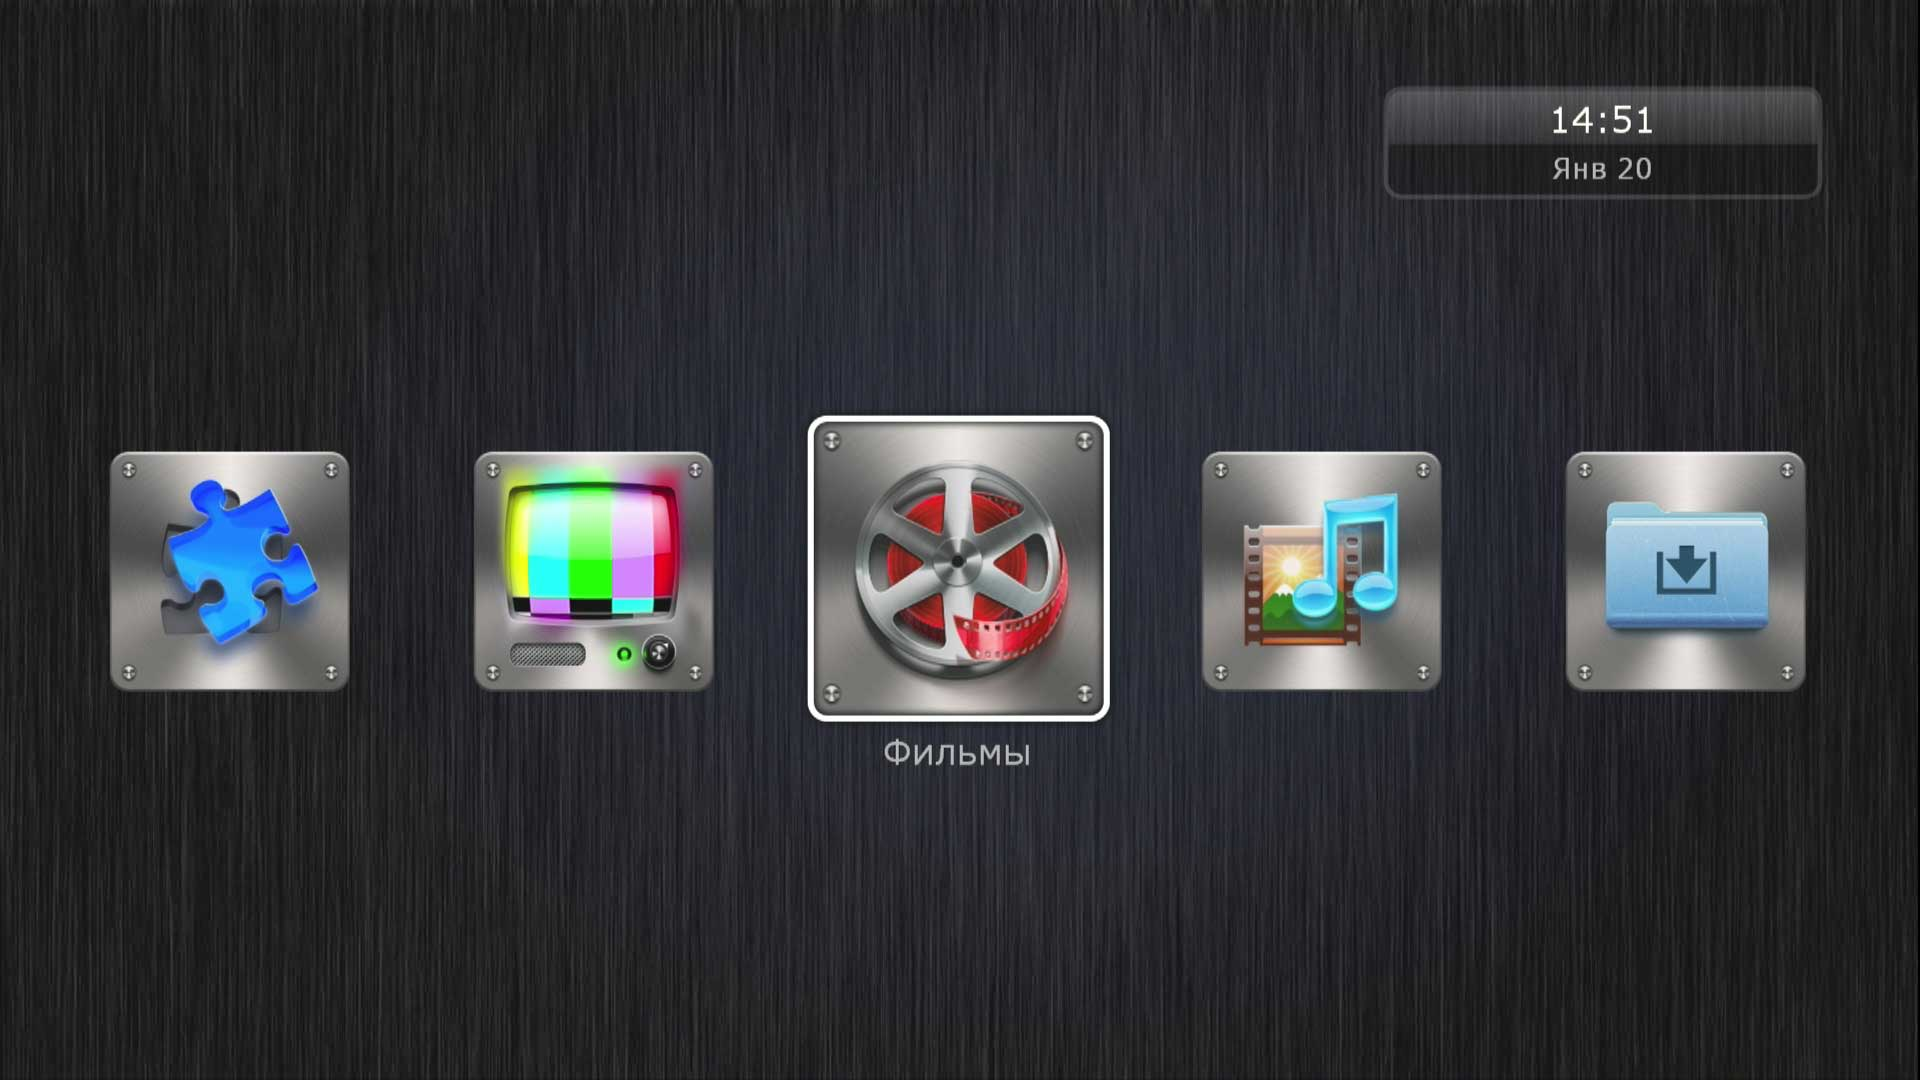 Приставка Dune HD SmartBox 4K Plus